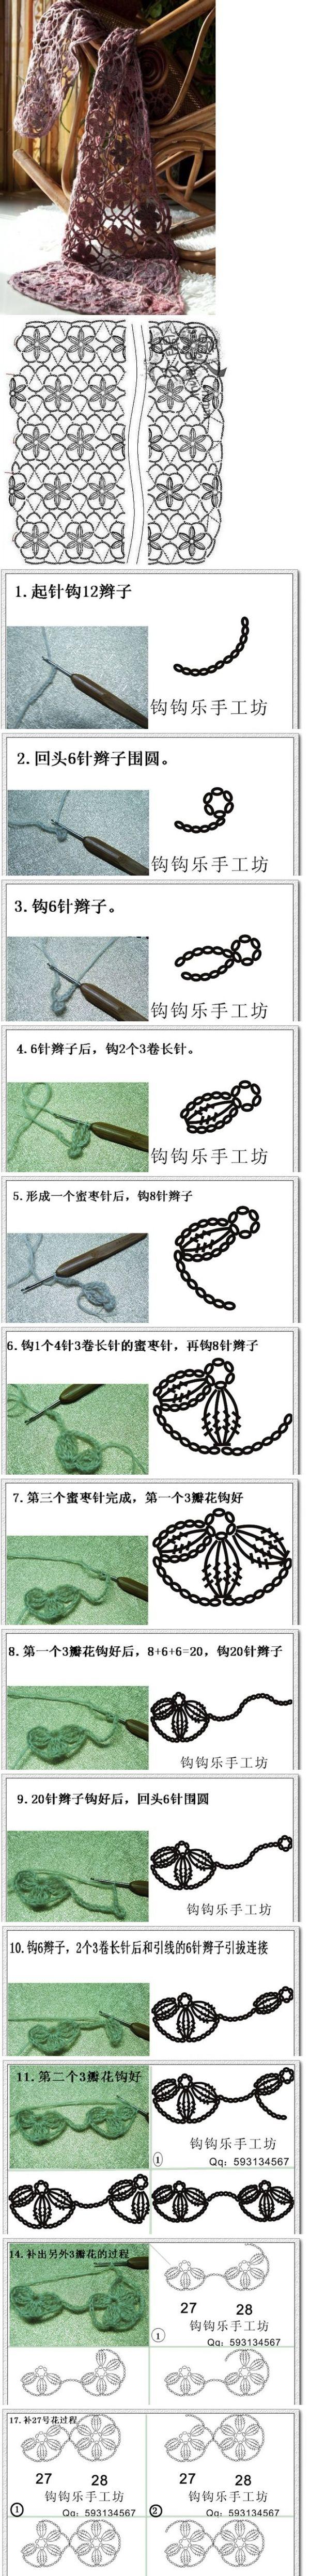 crochet flower scarf - step by step tutorial